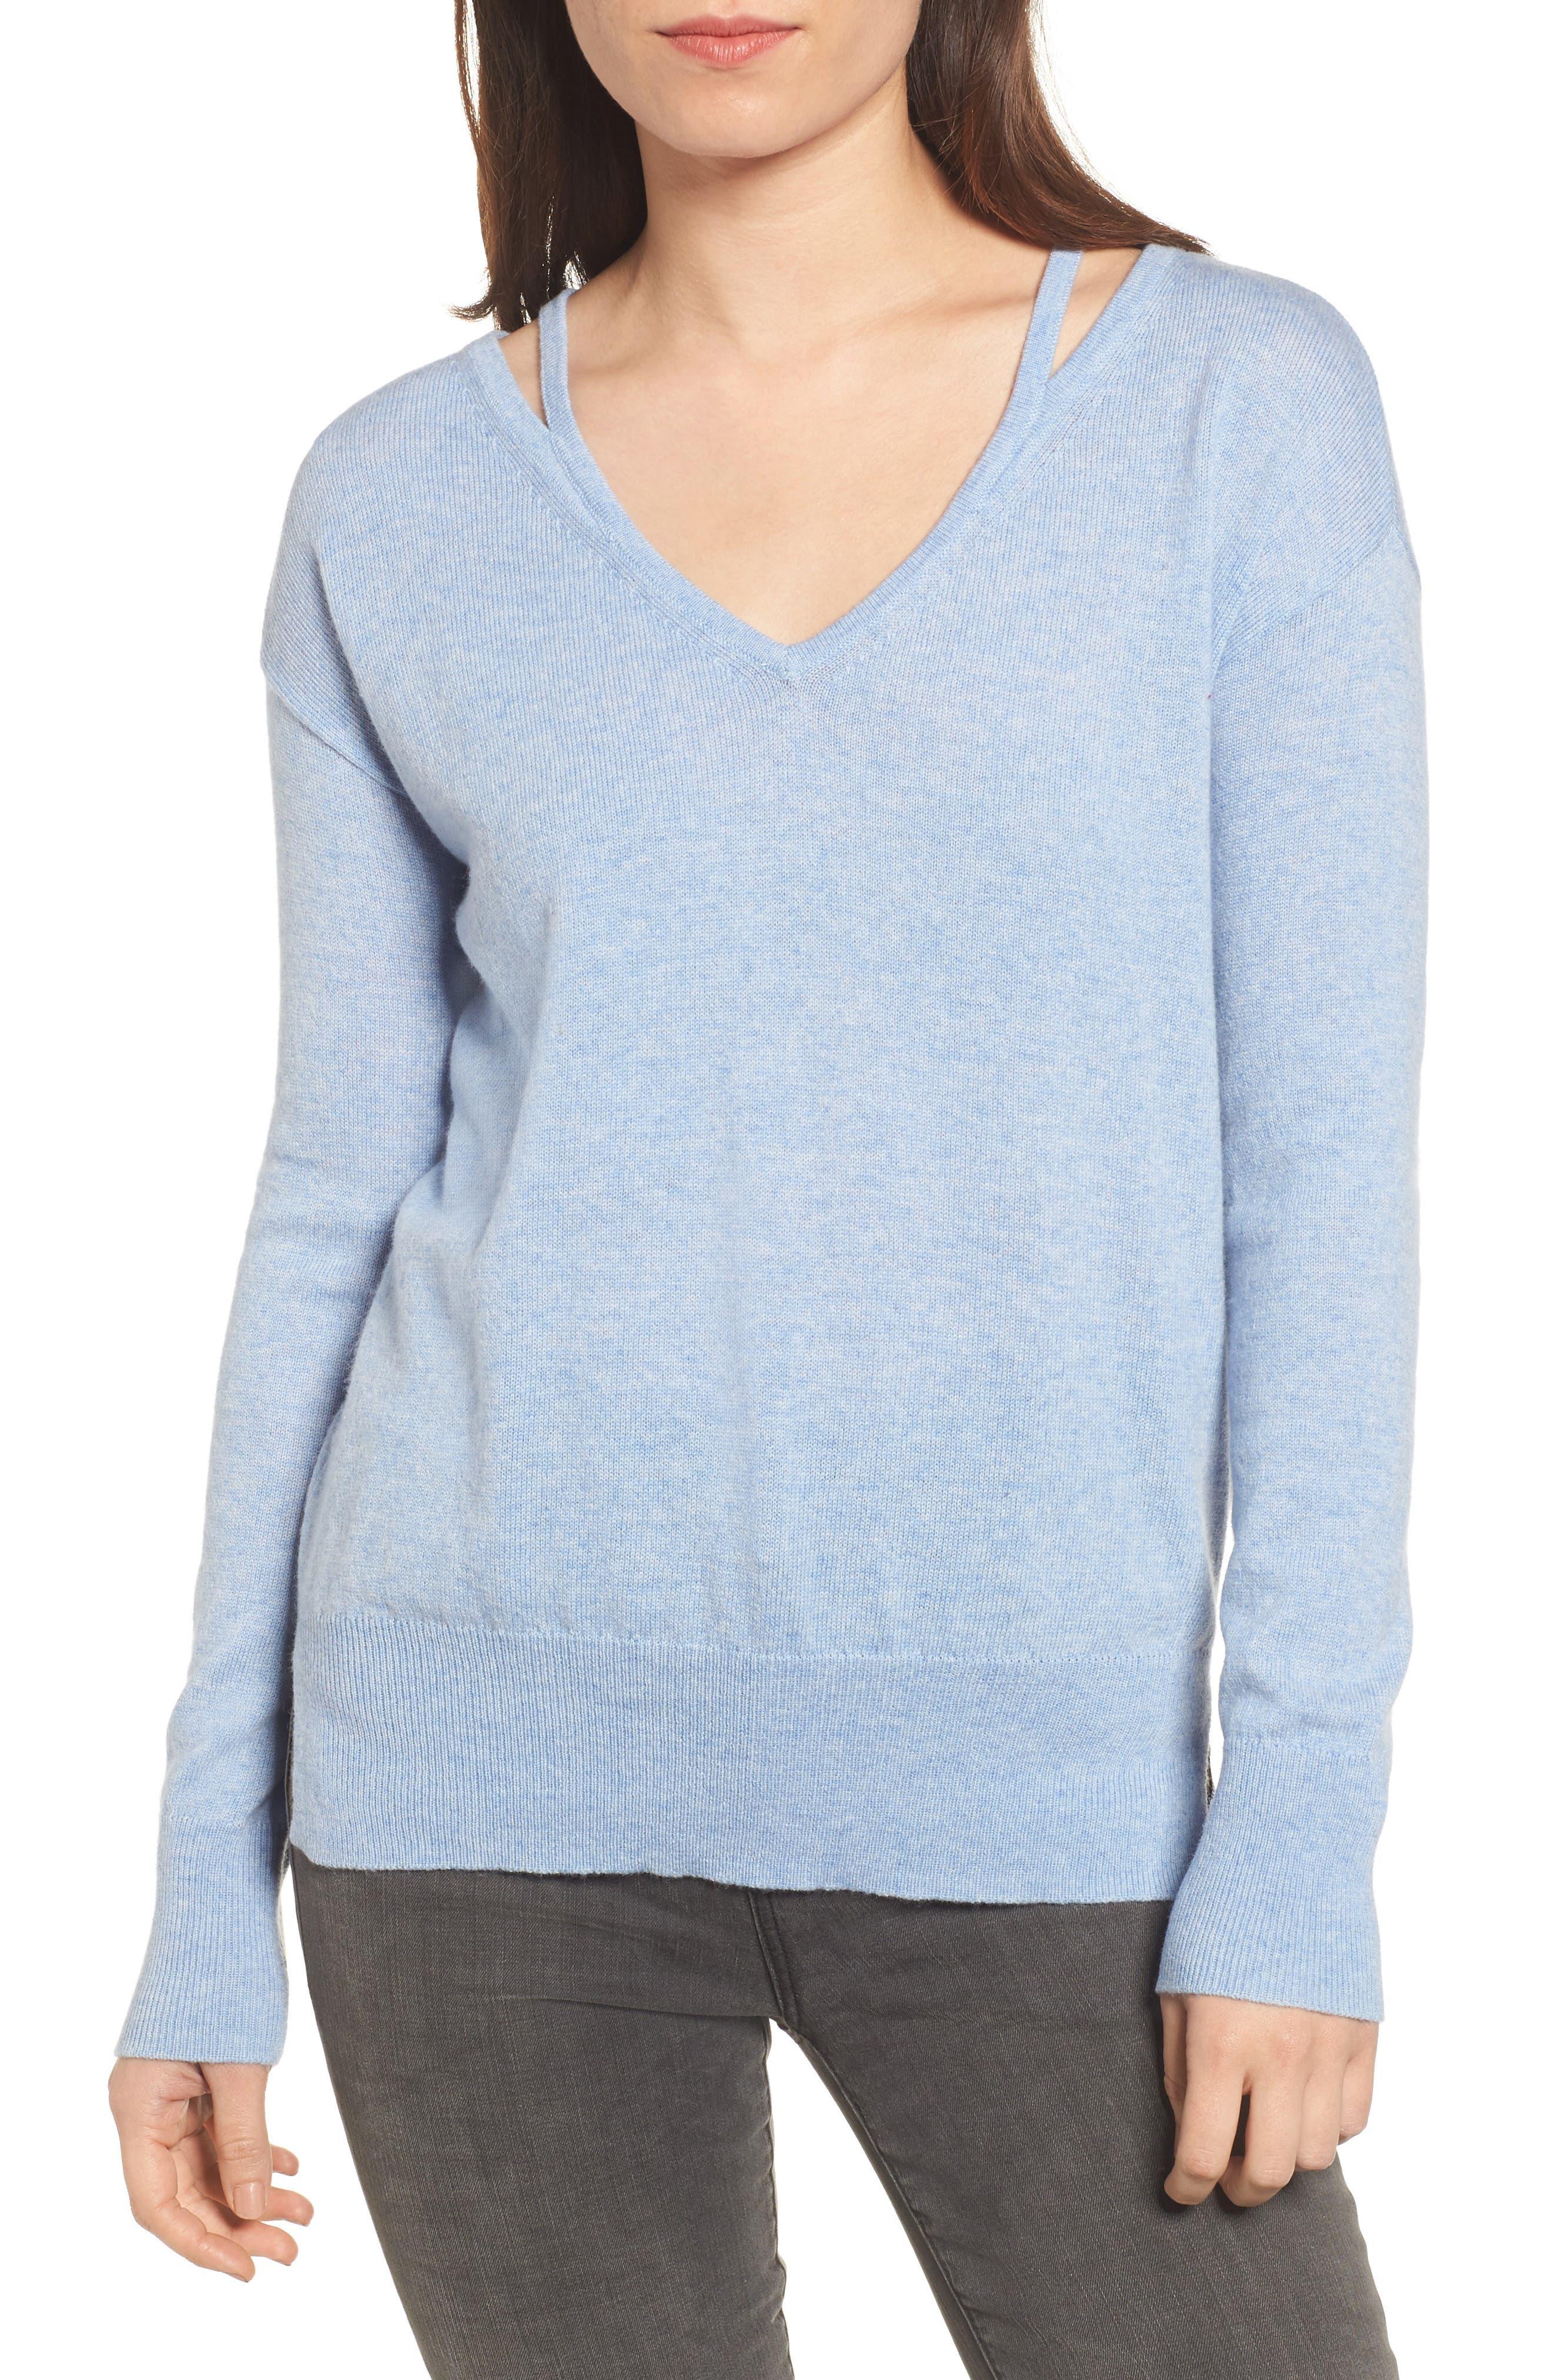 Rebecca Minkoff Kenley Wool & Cashmere Sweater